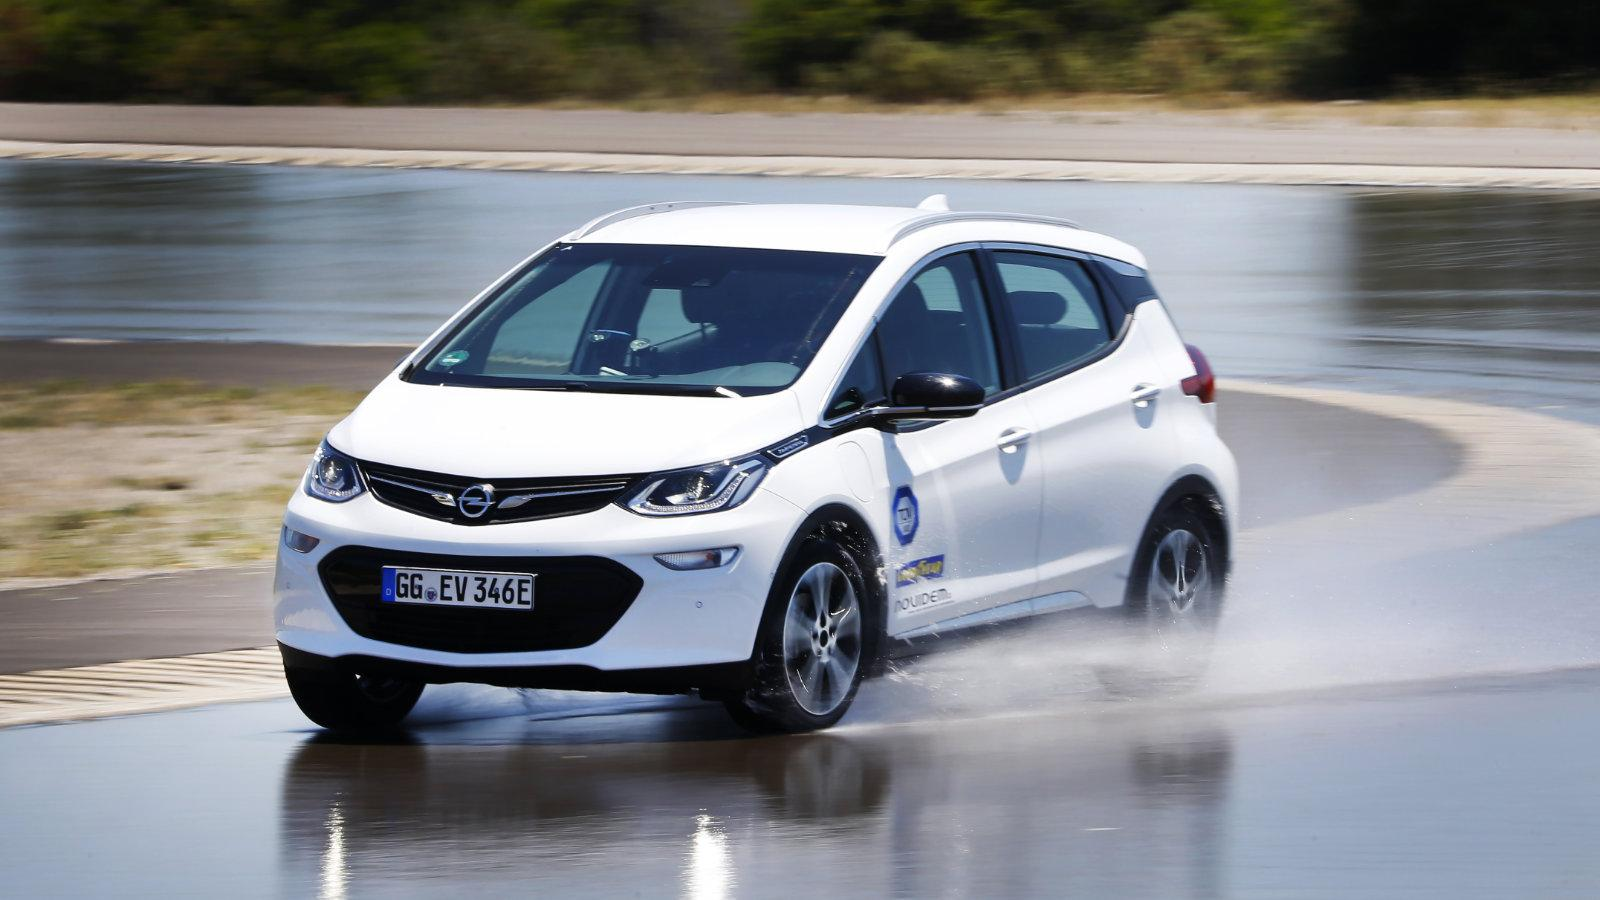 Auto illustrierte: Tест шин для электромобилей 2018